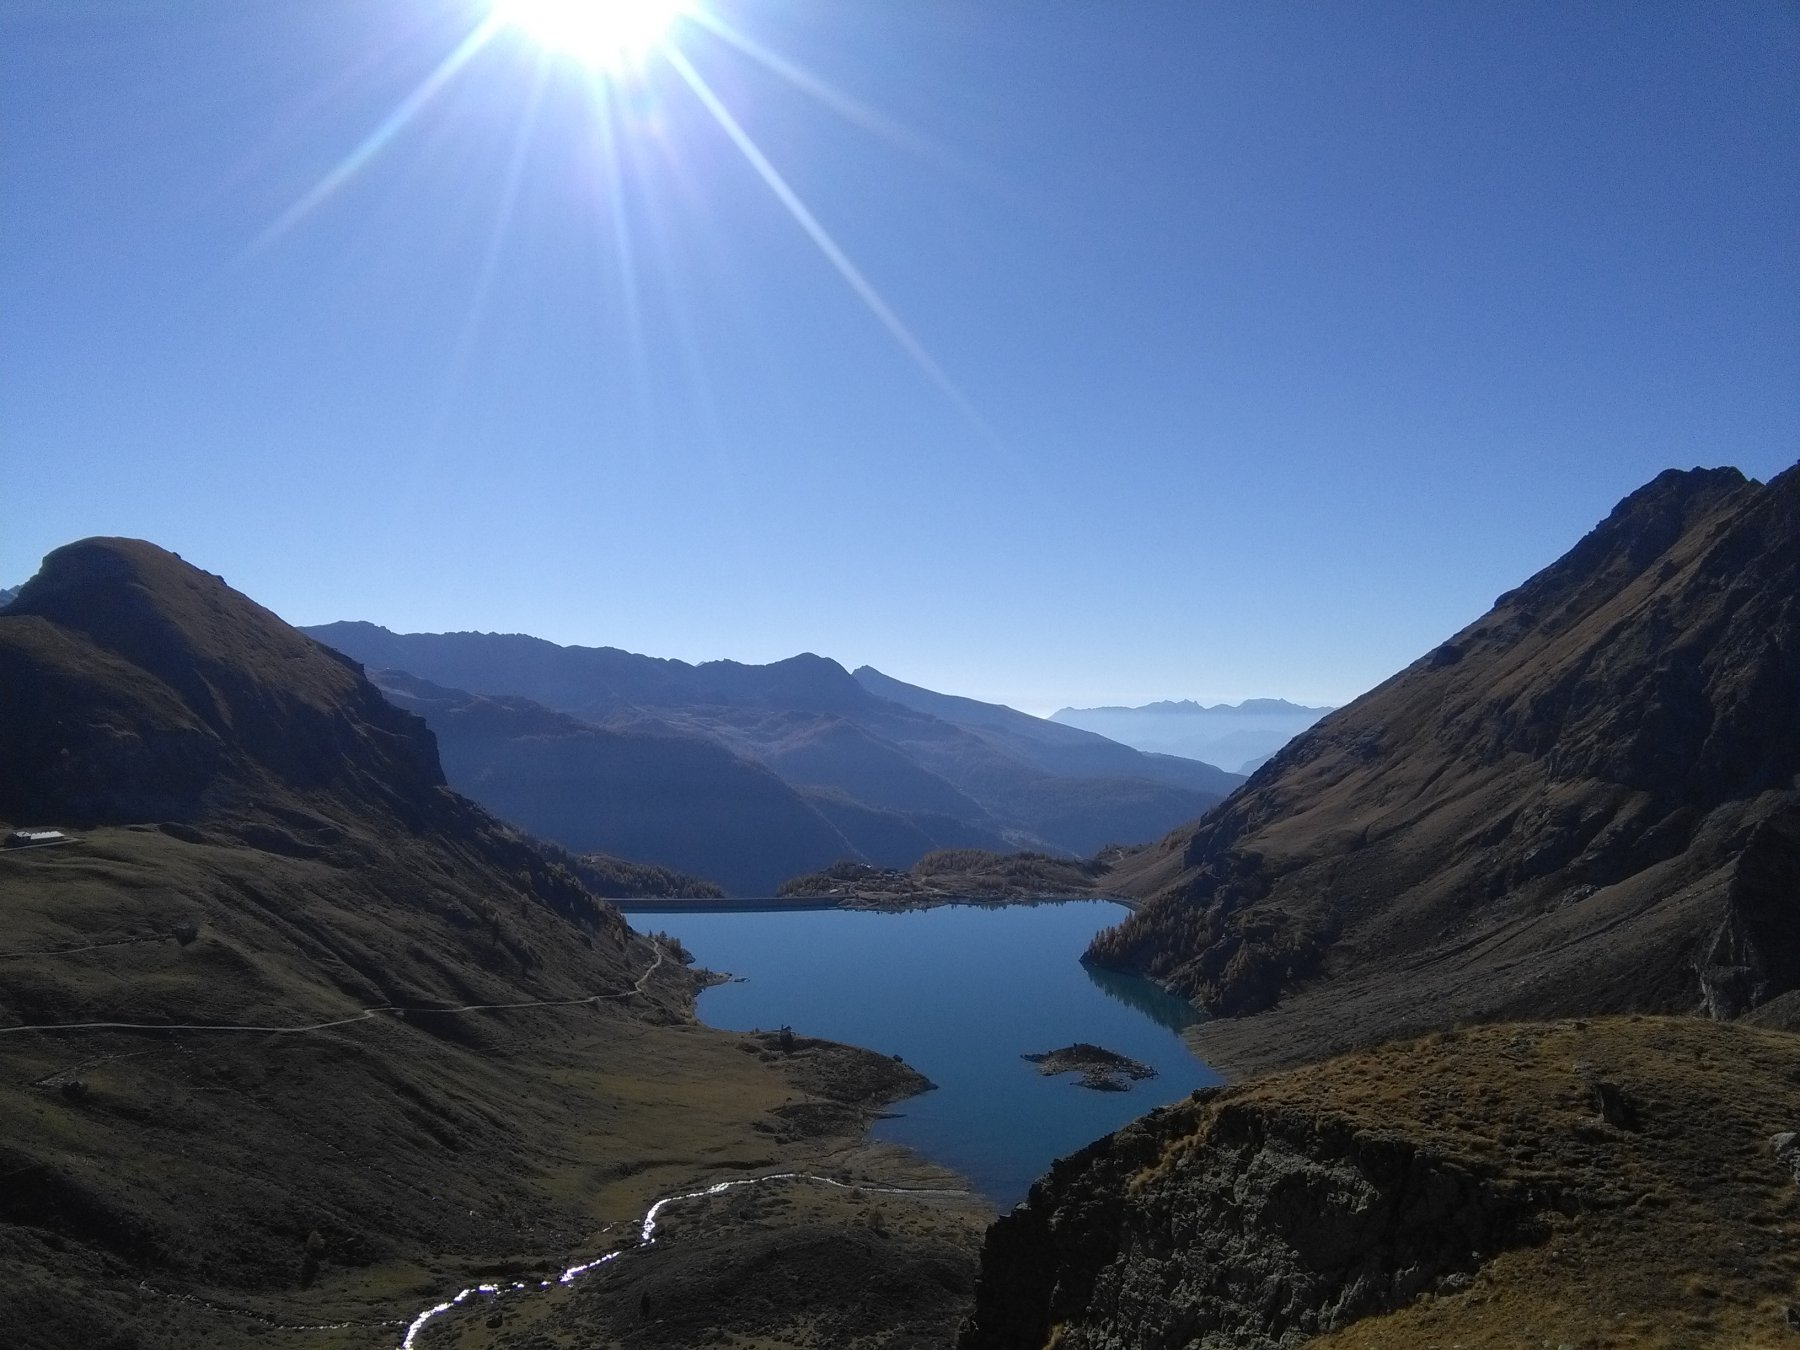 Lago cignana